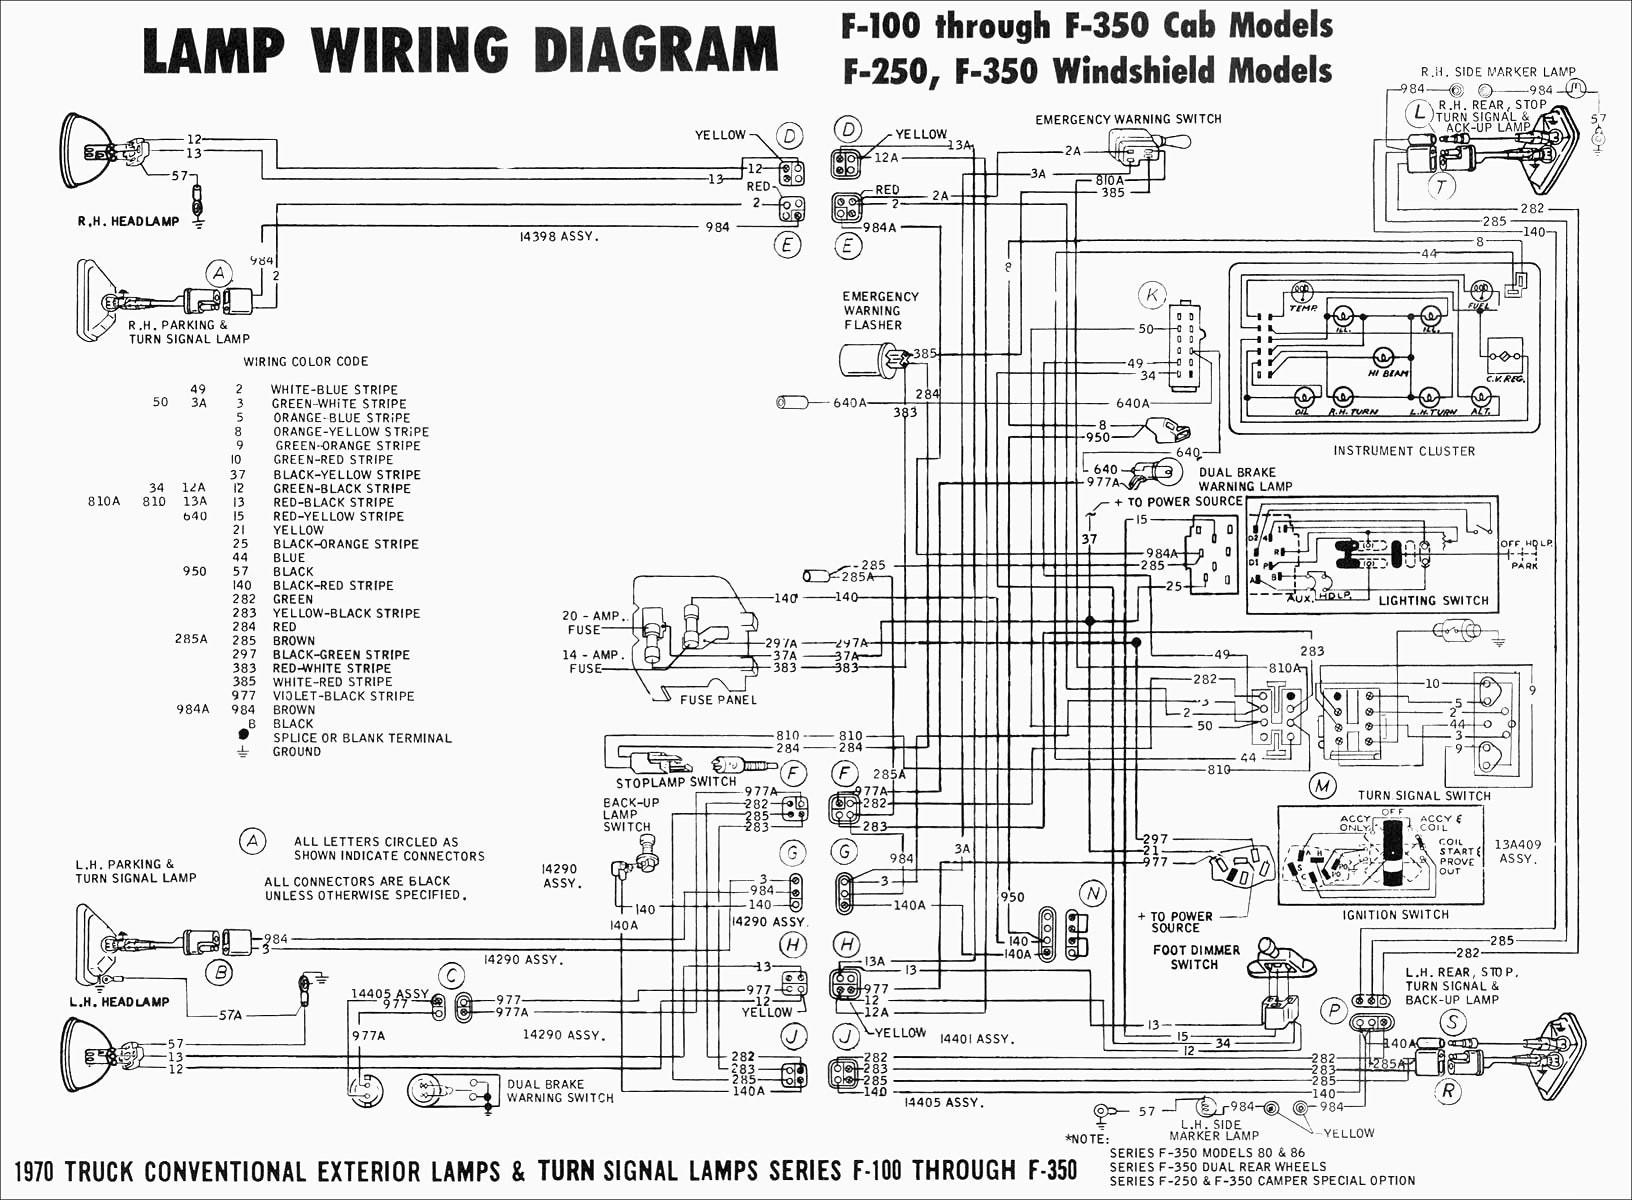 97 Jeep Grand Cherokee Wiring Diagram Stereo - Wiring Diagram